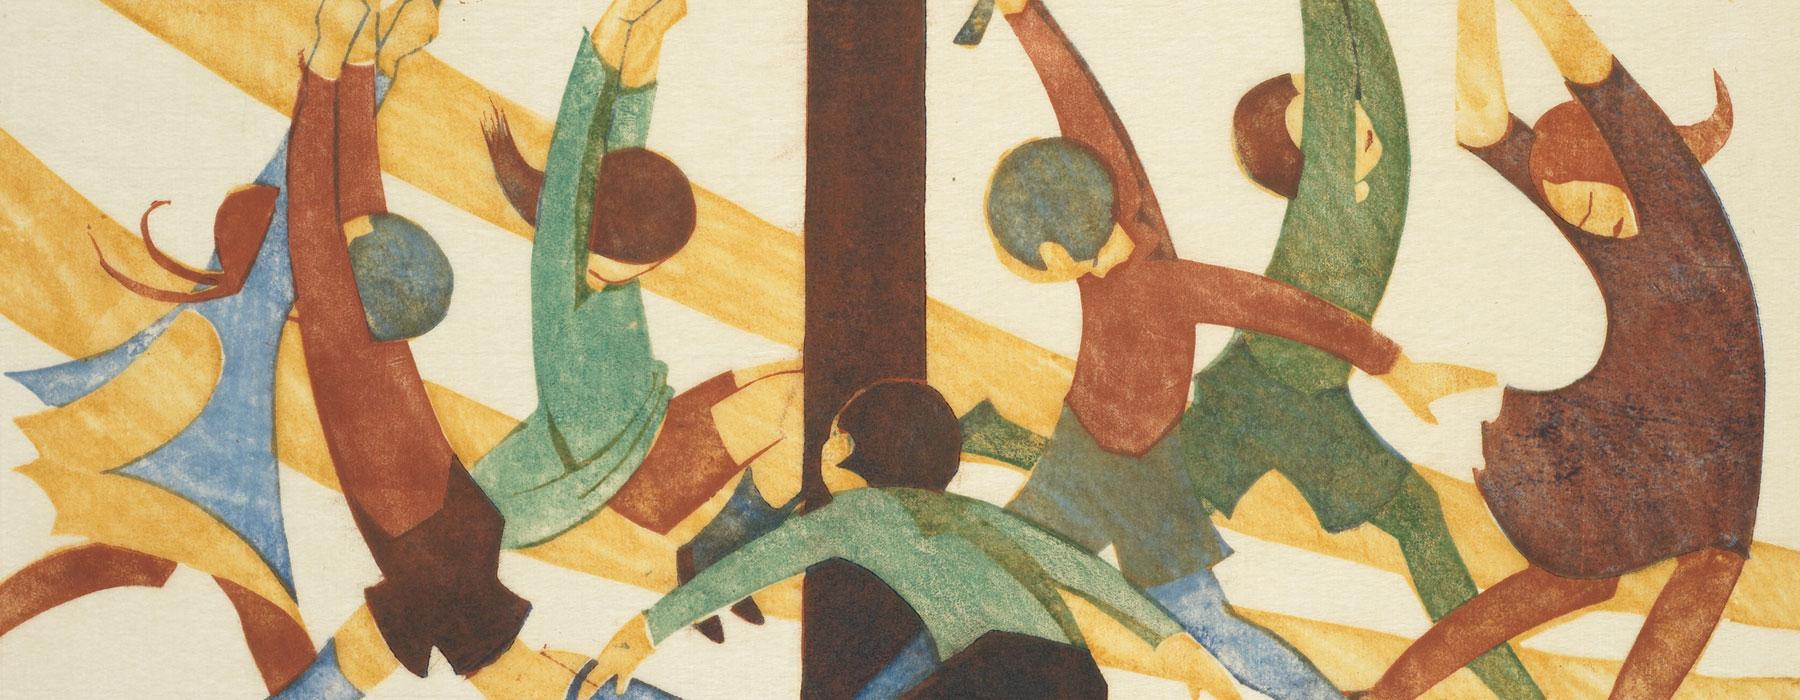 The giant stride, 1933, by Ethel Spowers. Gift of Rex Nan Kivell, 1953. Te Papa (1953-0003-325)